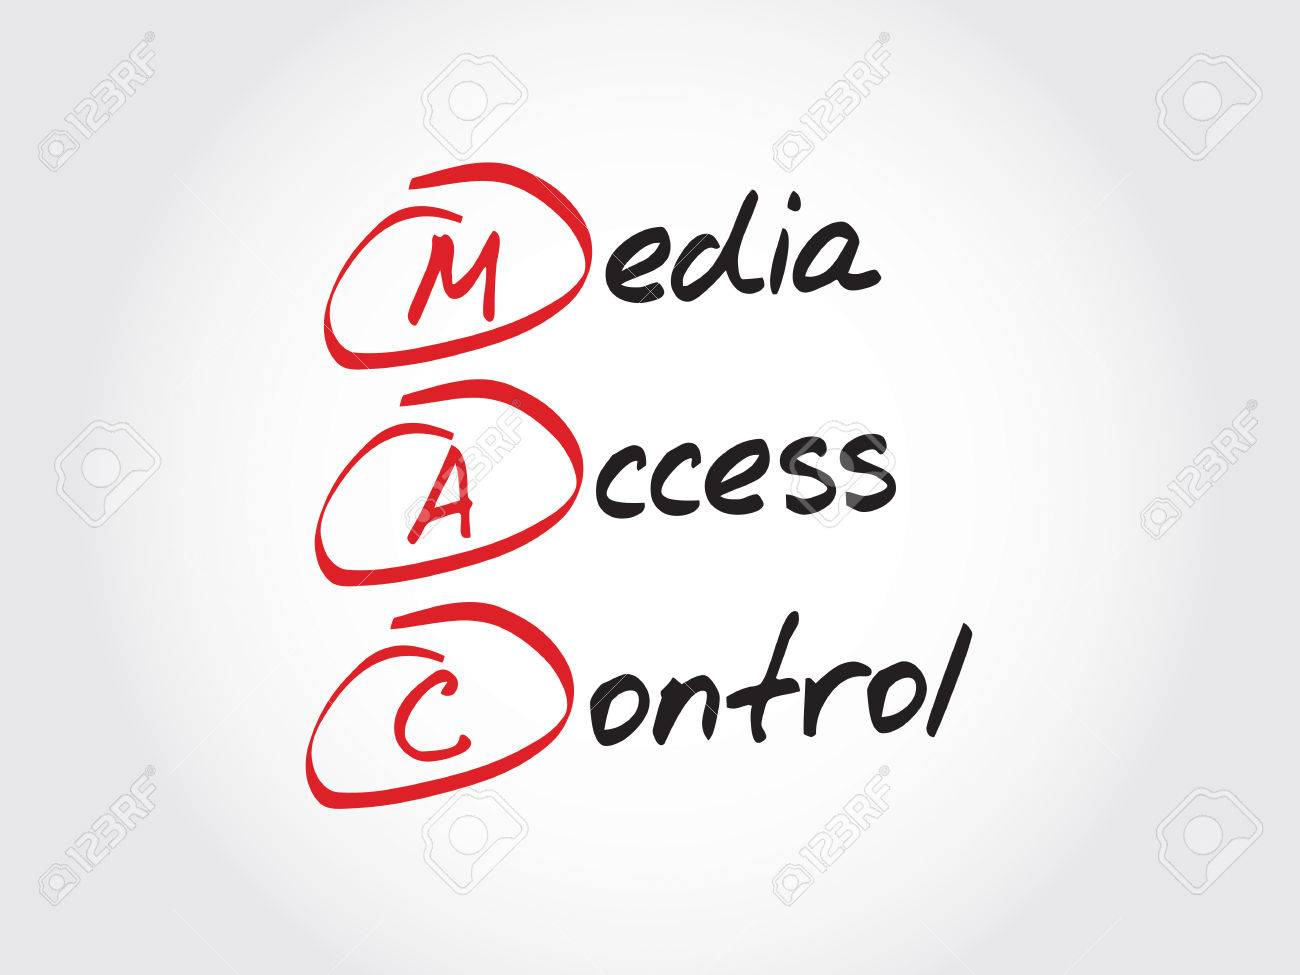 MAC メディア アクセス制御、頭字語概念のイラスト素材・ベクタ ...